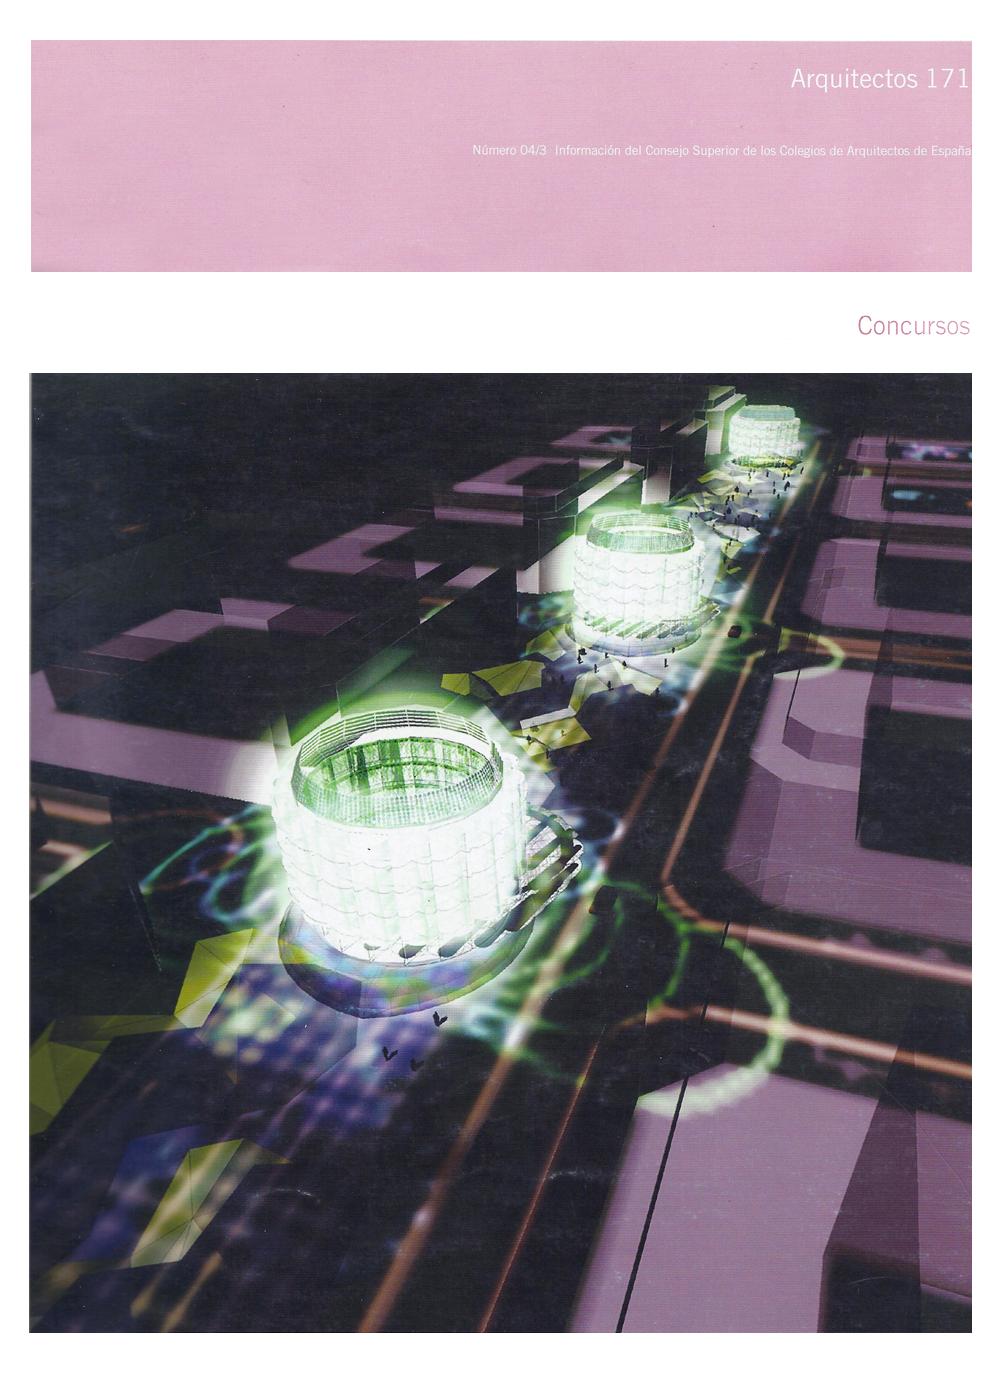 Arquitectos171.png